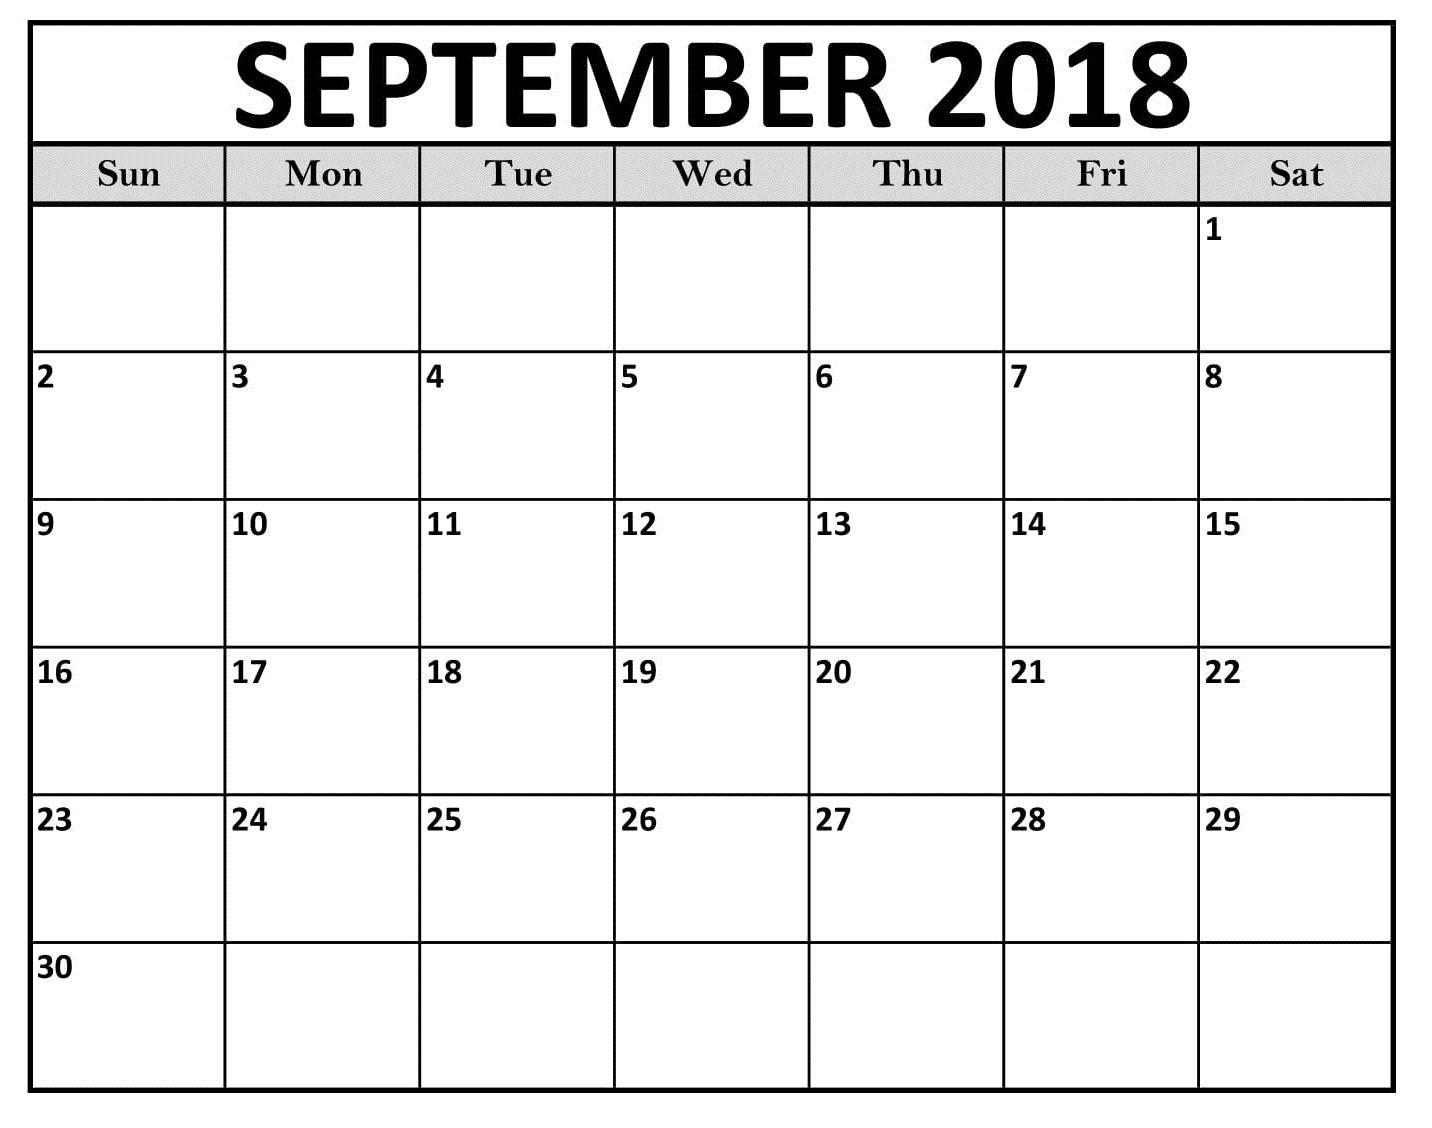 September 2018 Pdf Waterproof Calendar   Calendar Download